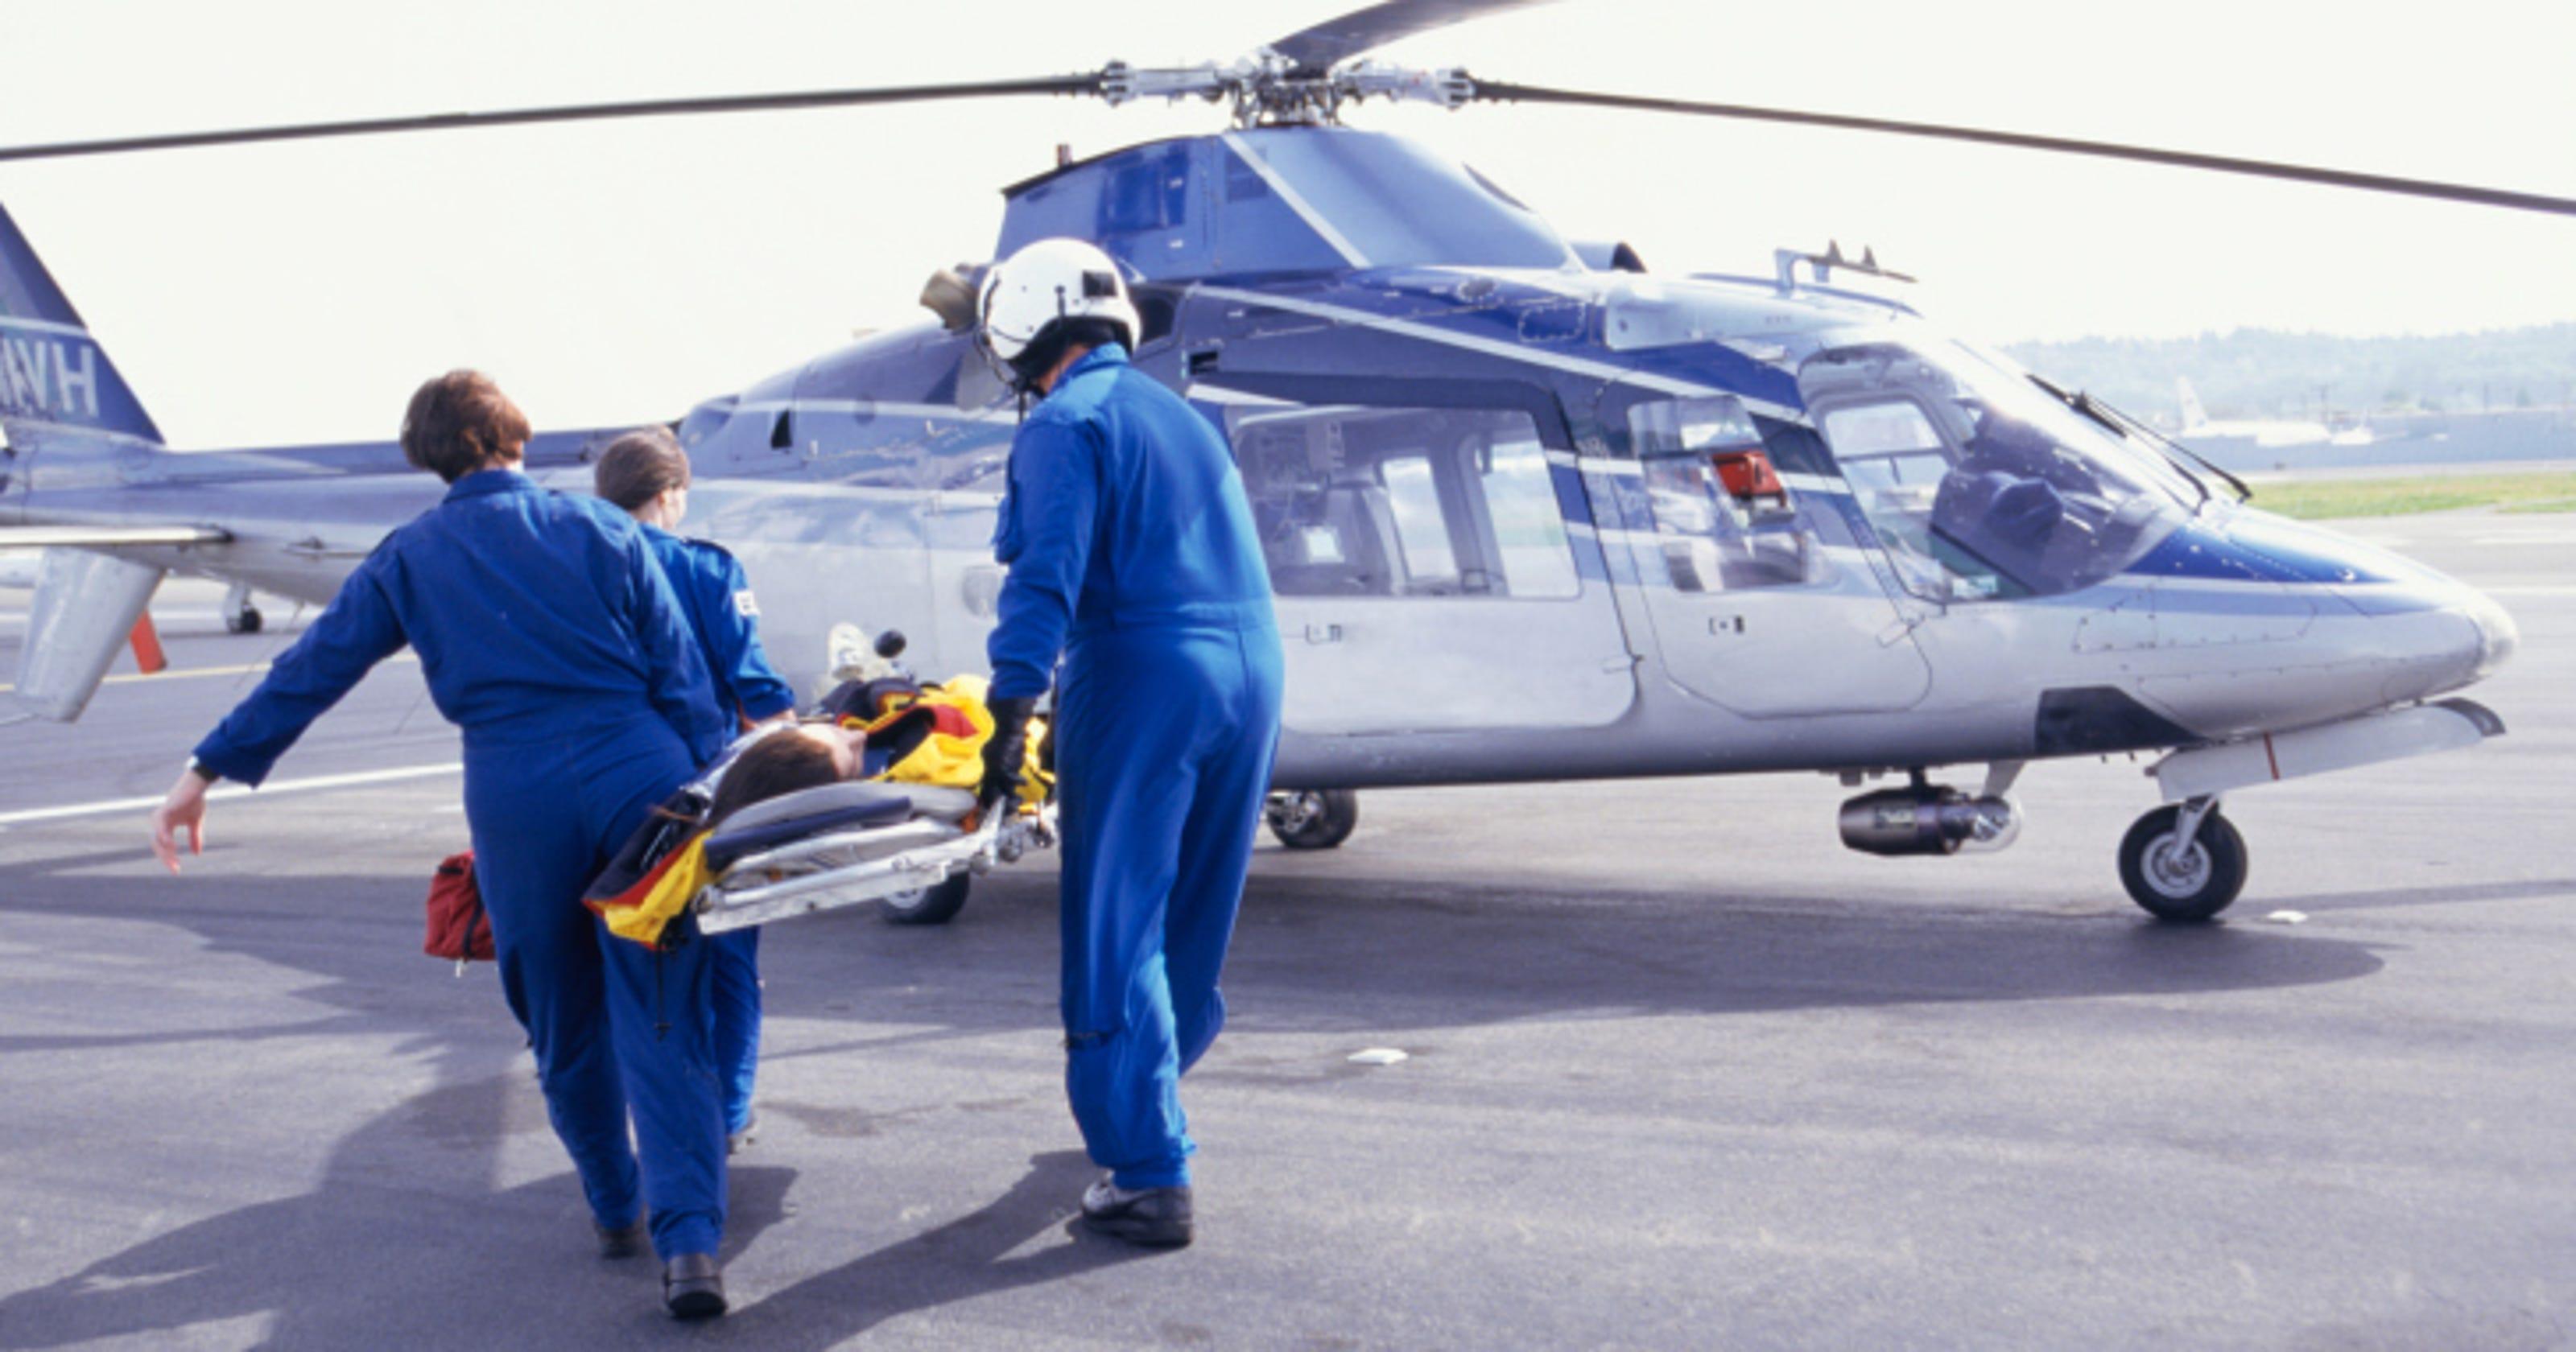 $64,000 air-ambulance bill puzzles Scottsdale woman